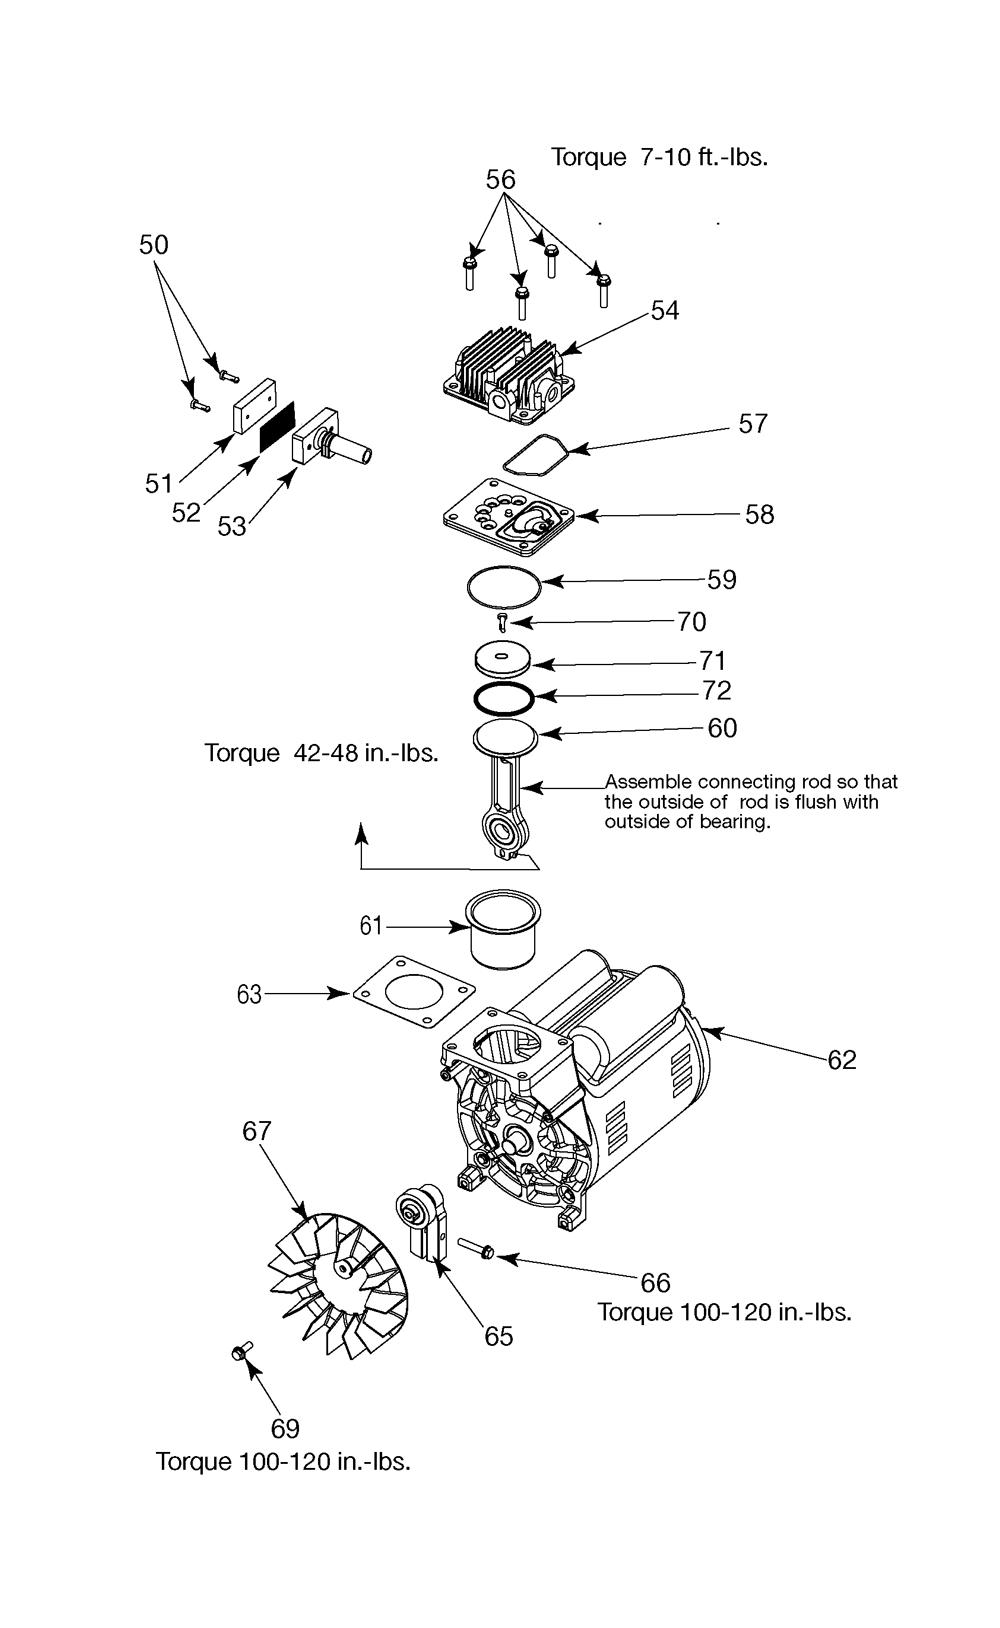 IRF412-Devilbiss-T1-PB-1Break Down